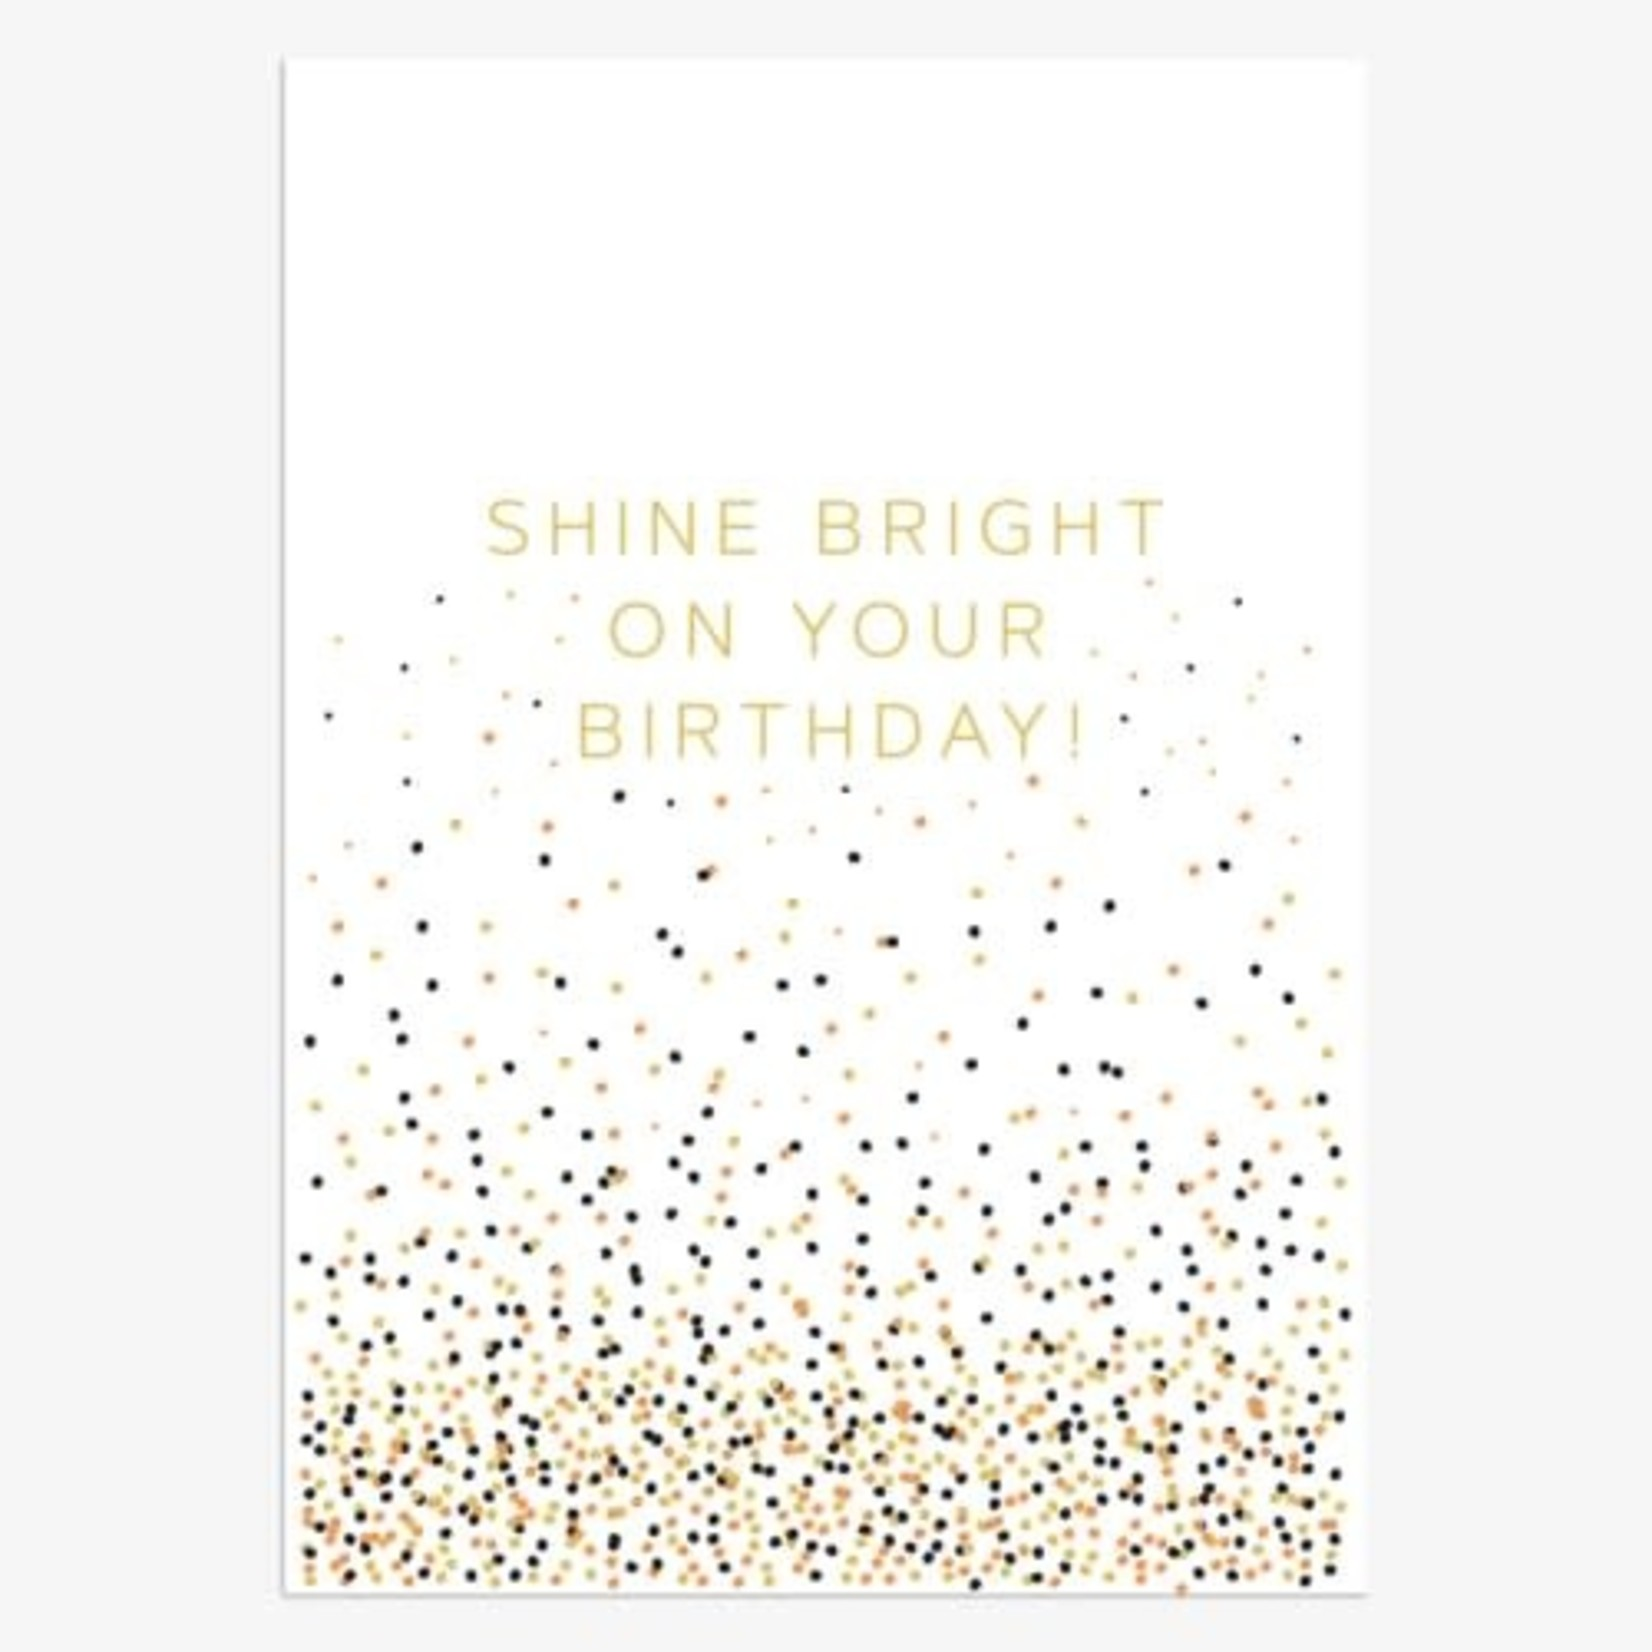 SHINE BRIGHT ON YOUR BIRTHDAY CARD